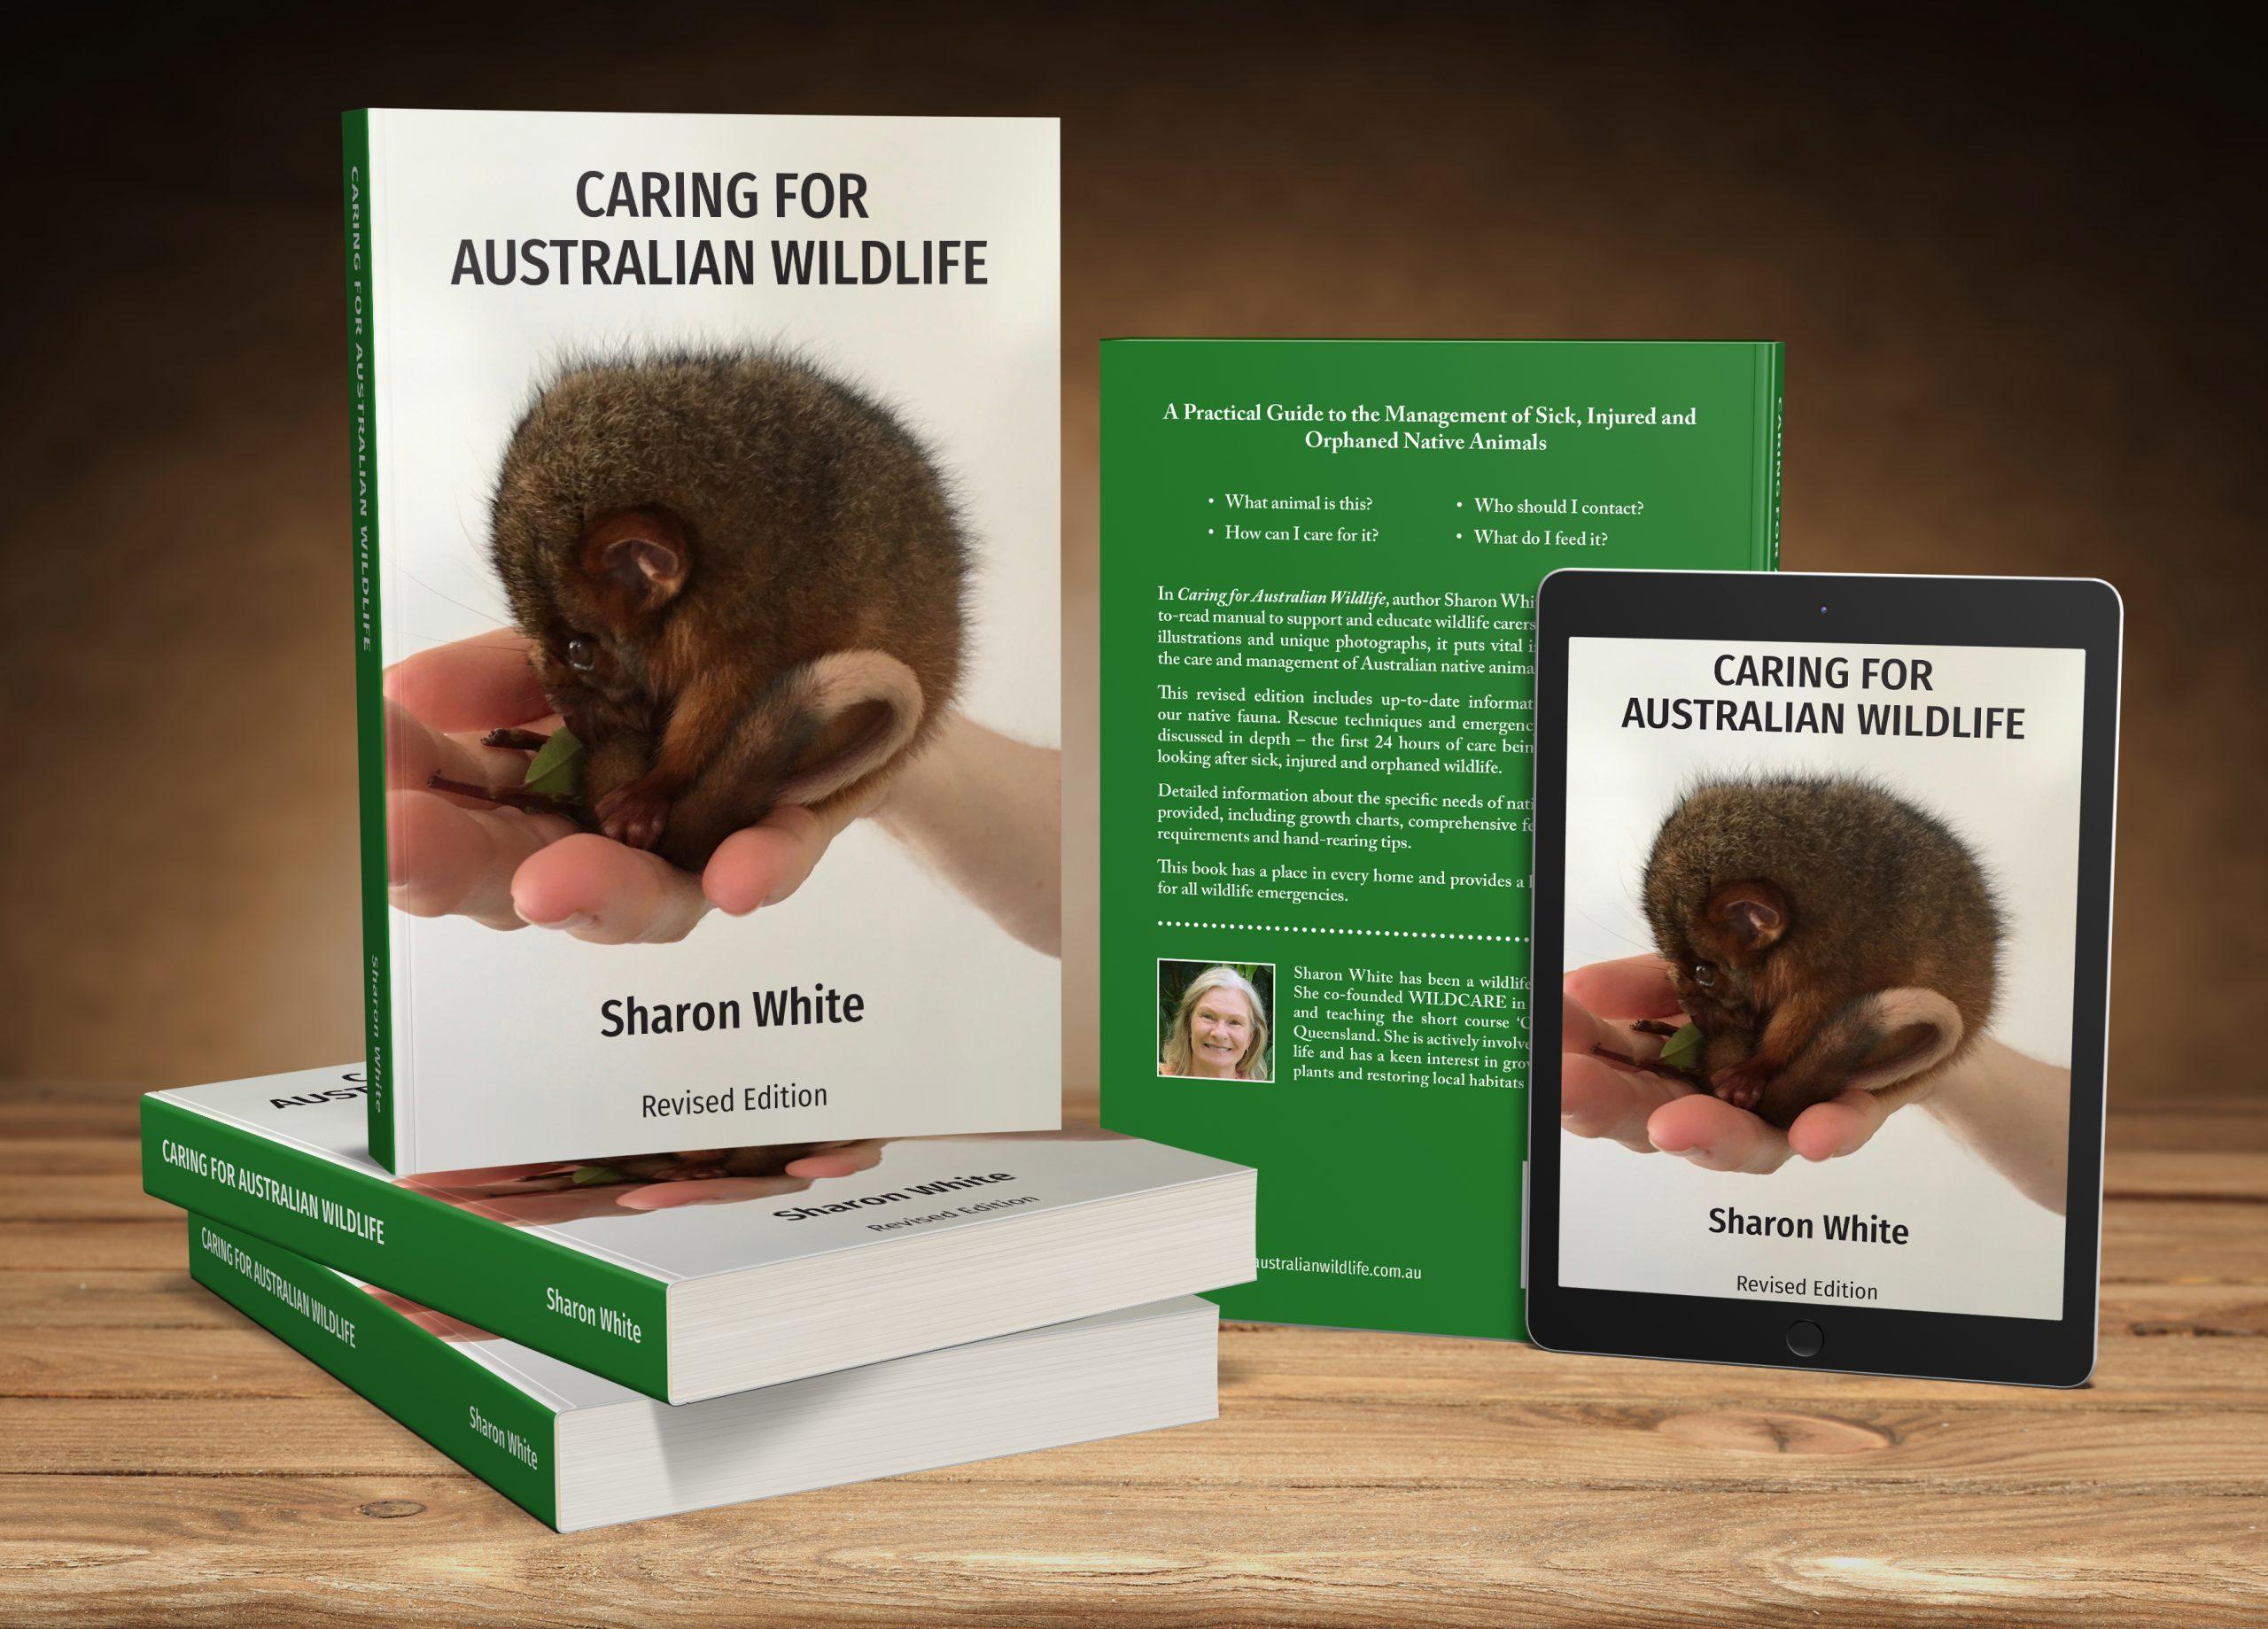 Caring for Australian Wildlife